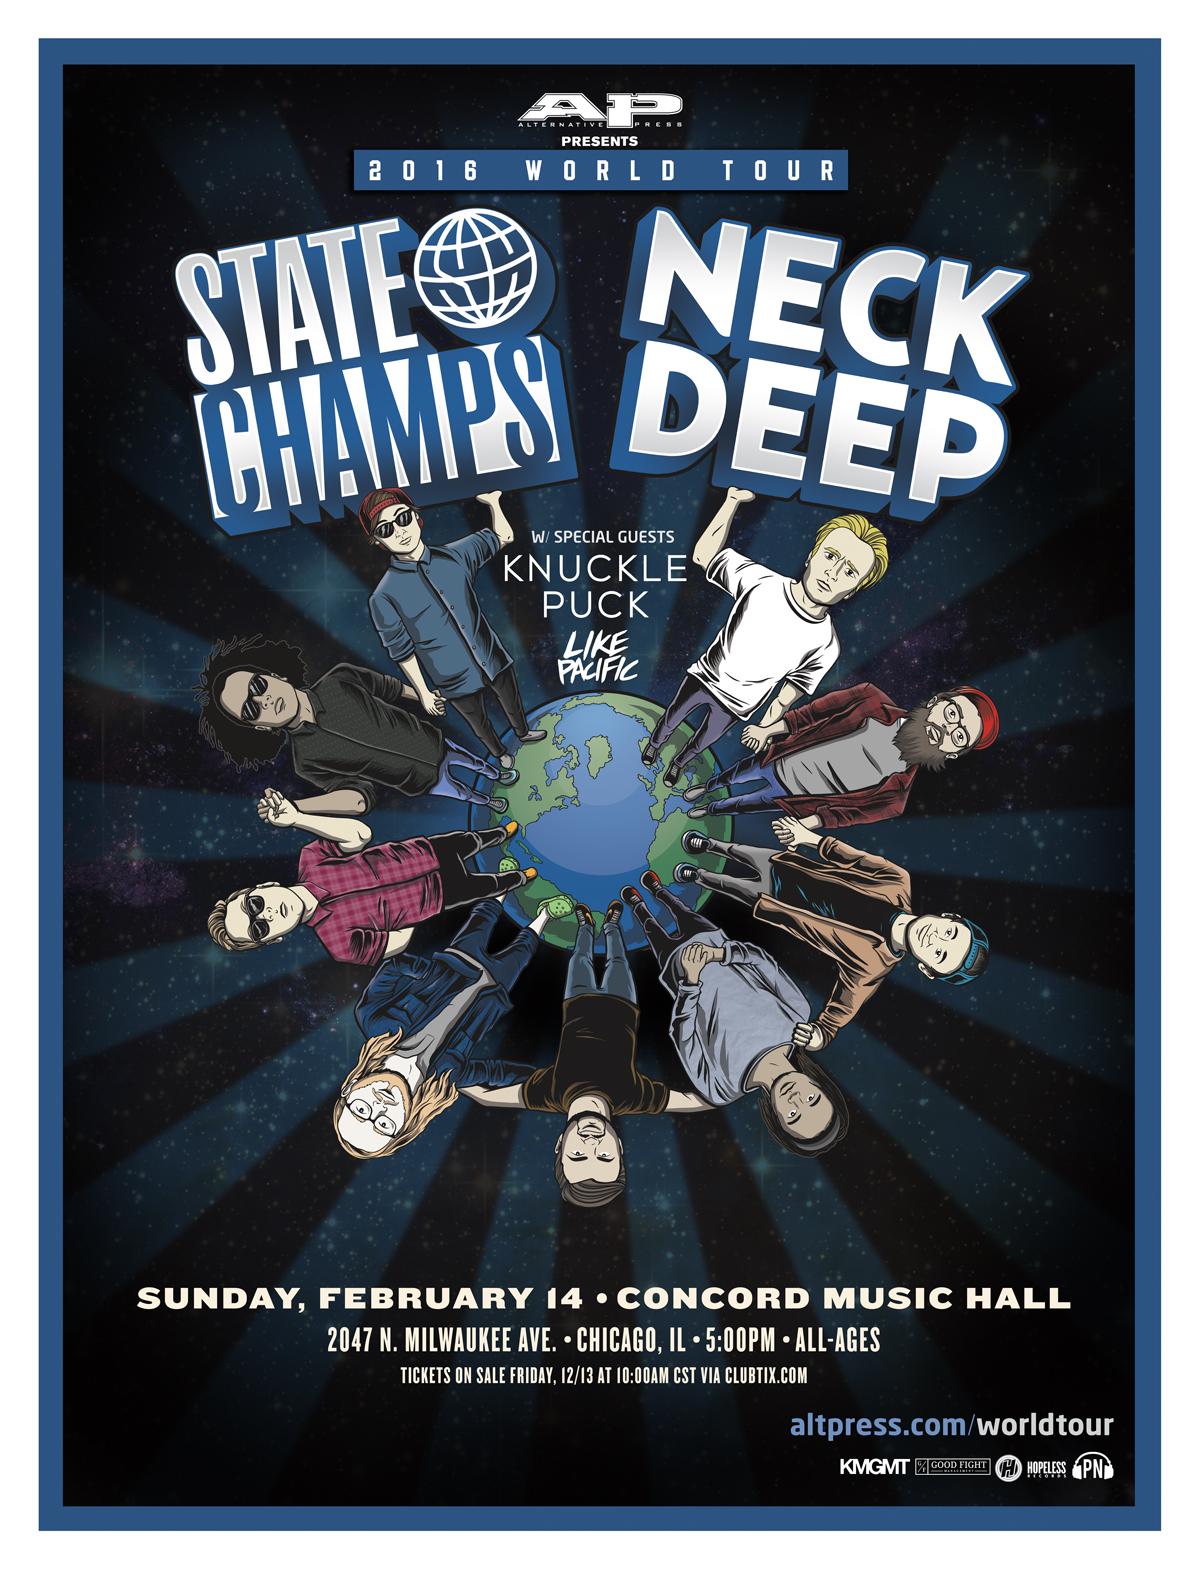 statechamps_neckdeep_admat